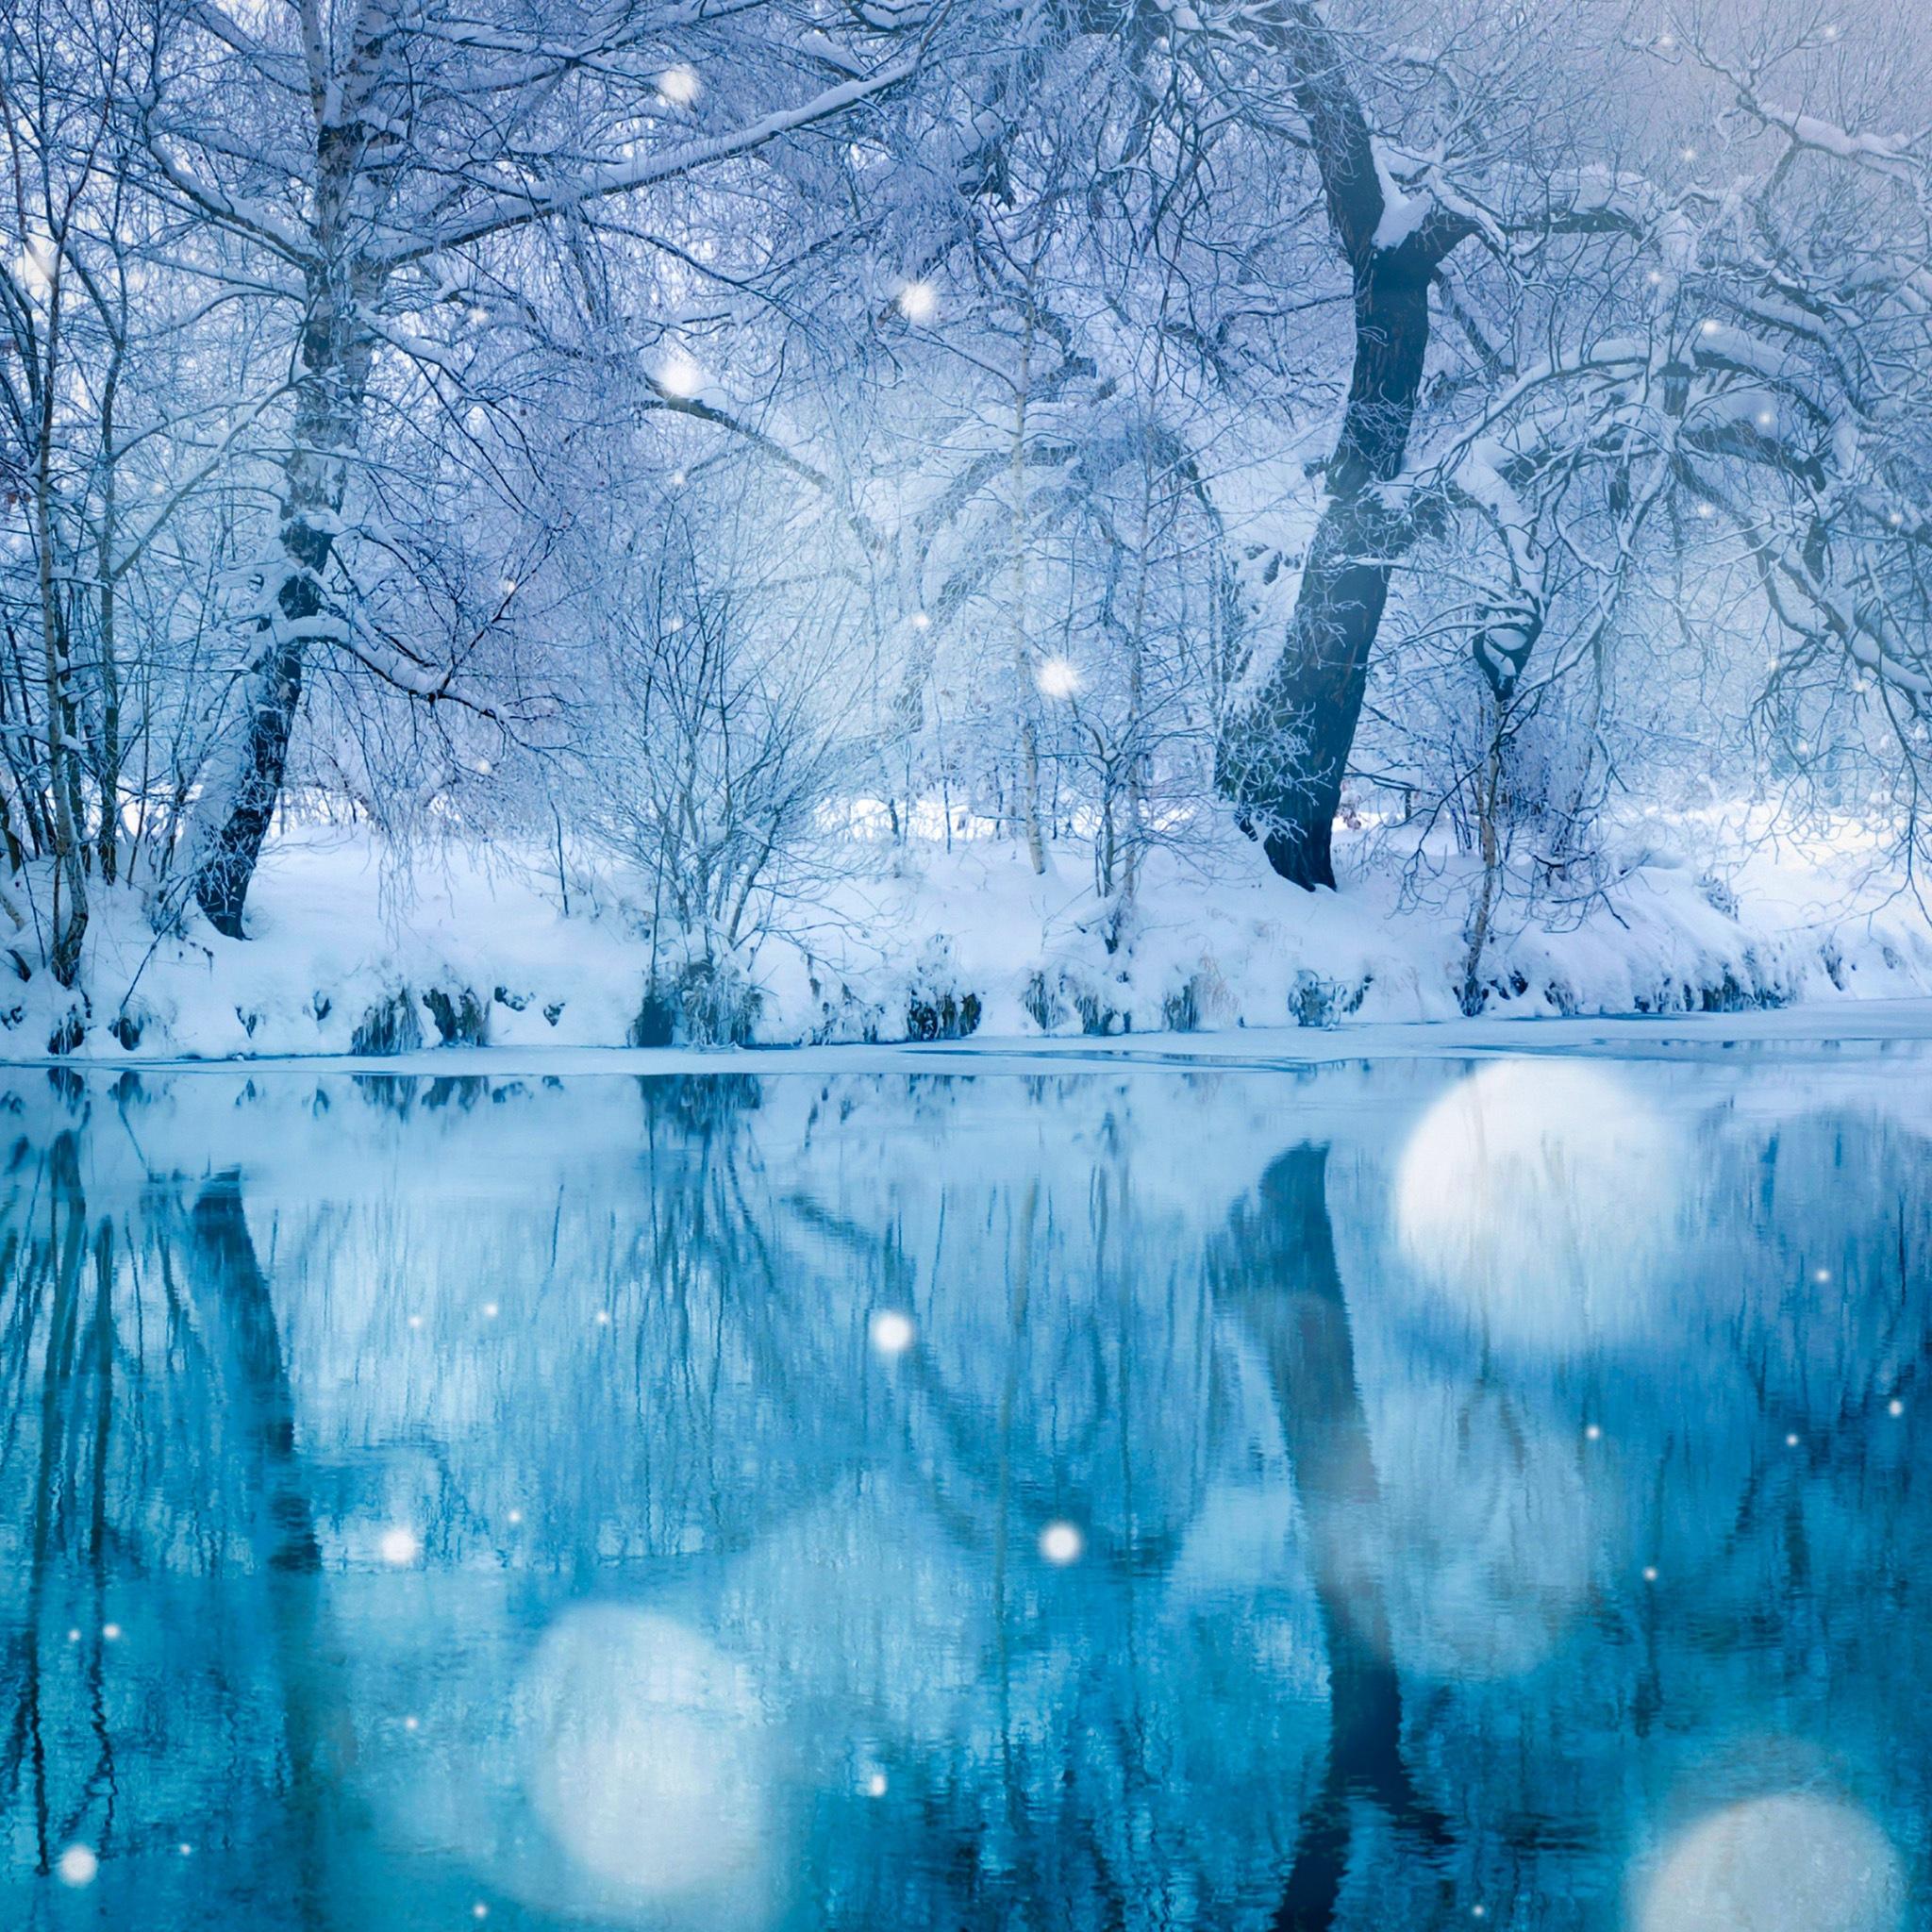 ★ Snowed-in Lake by @RetinaiPadWalls on twitter.jpg